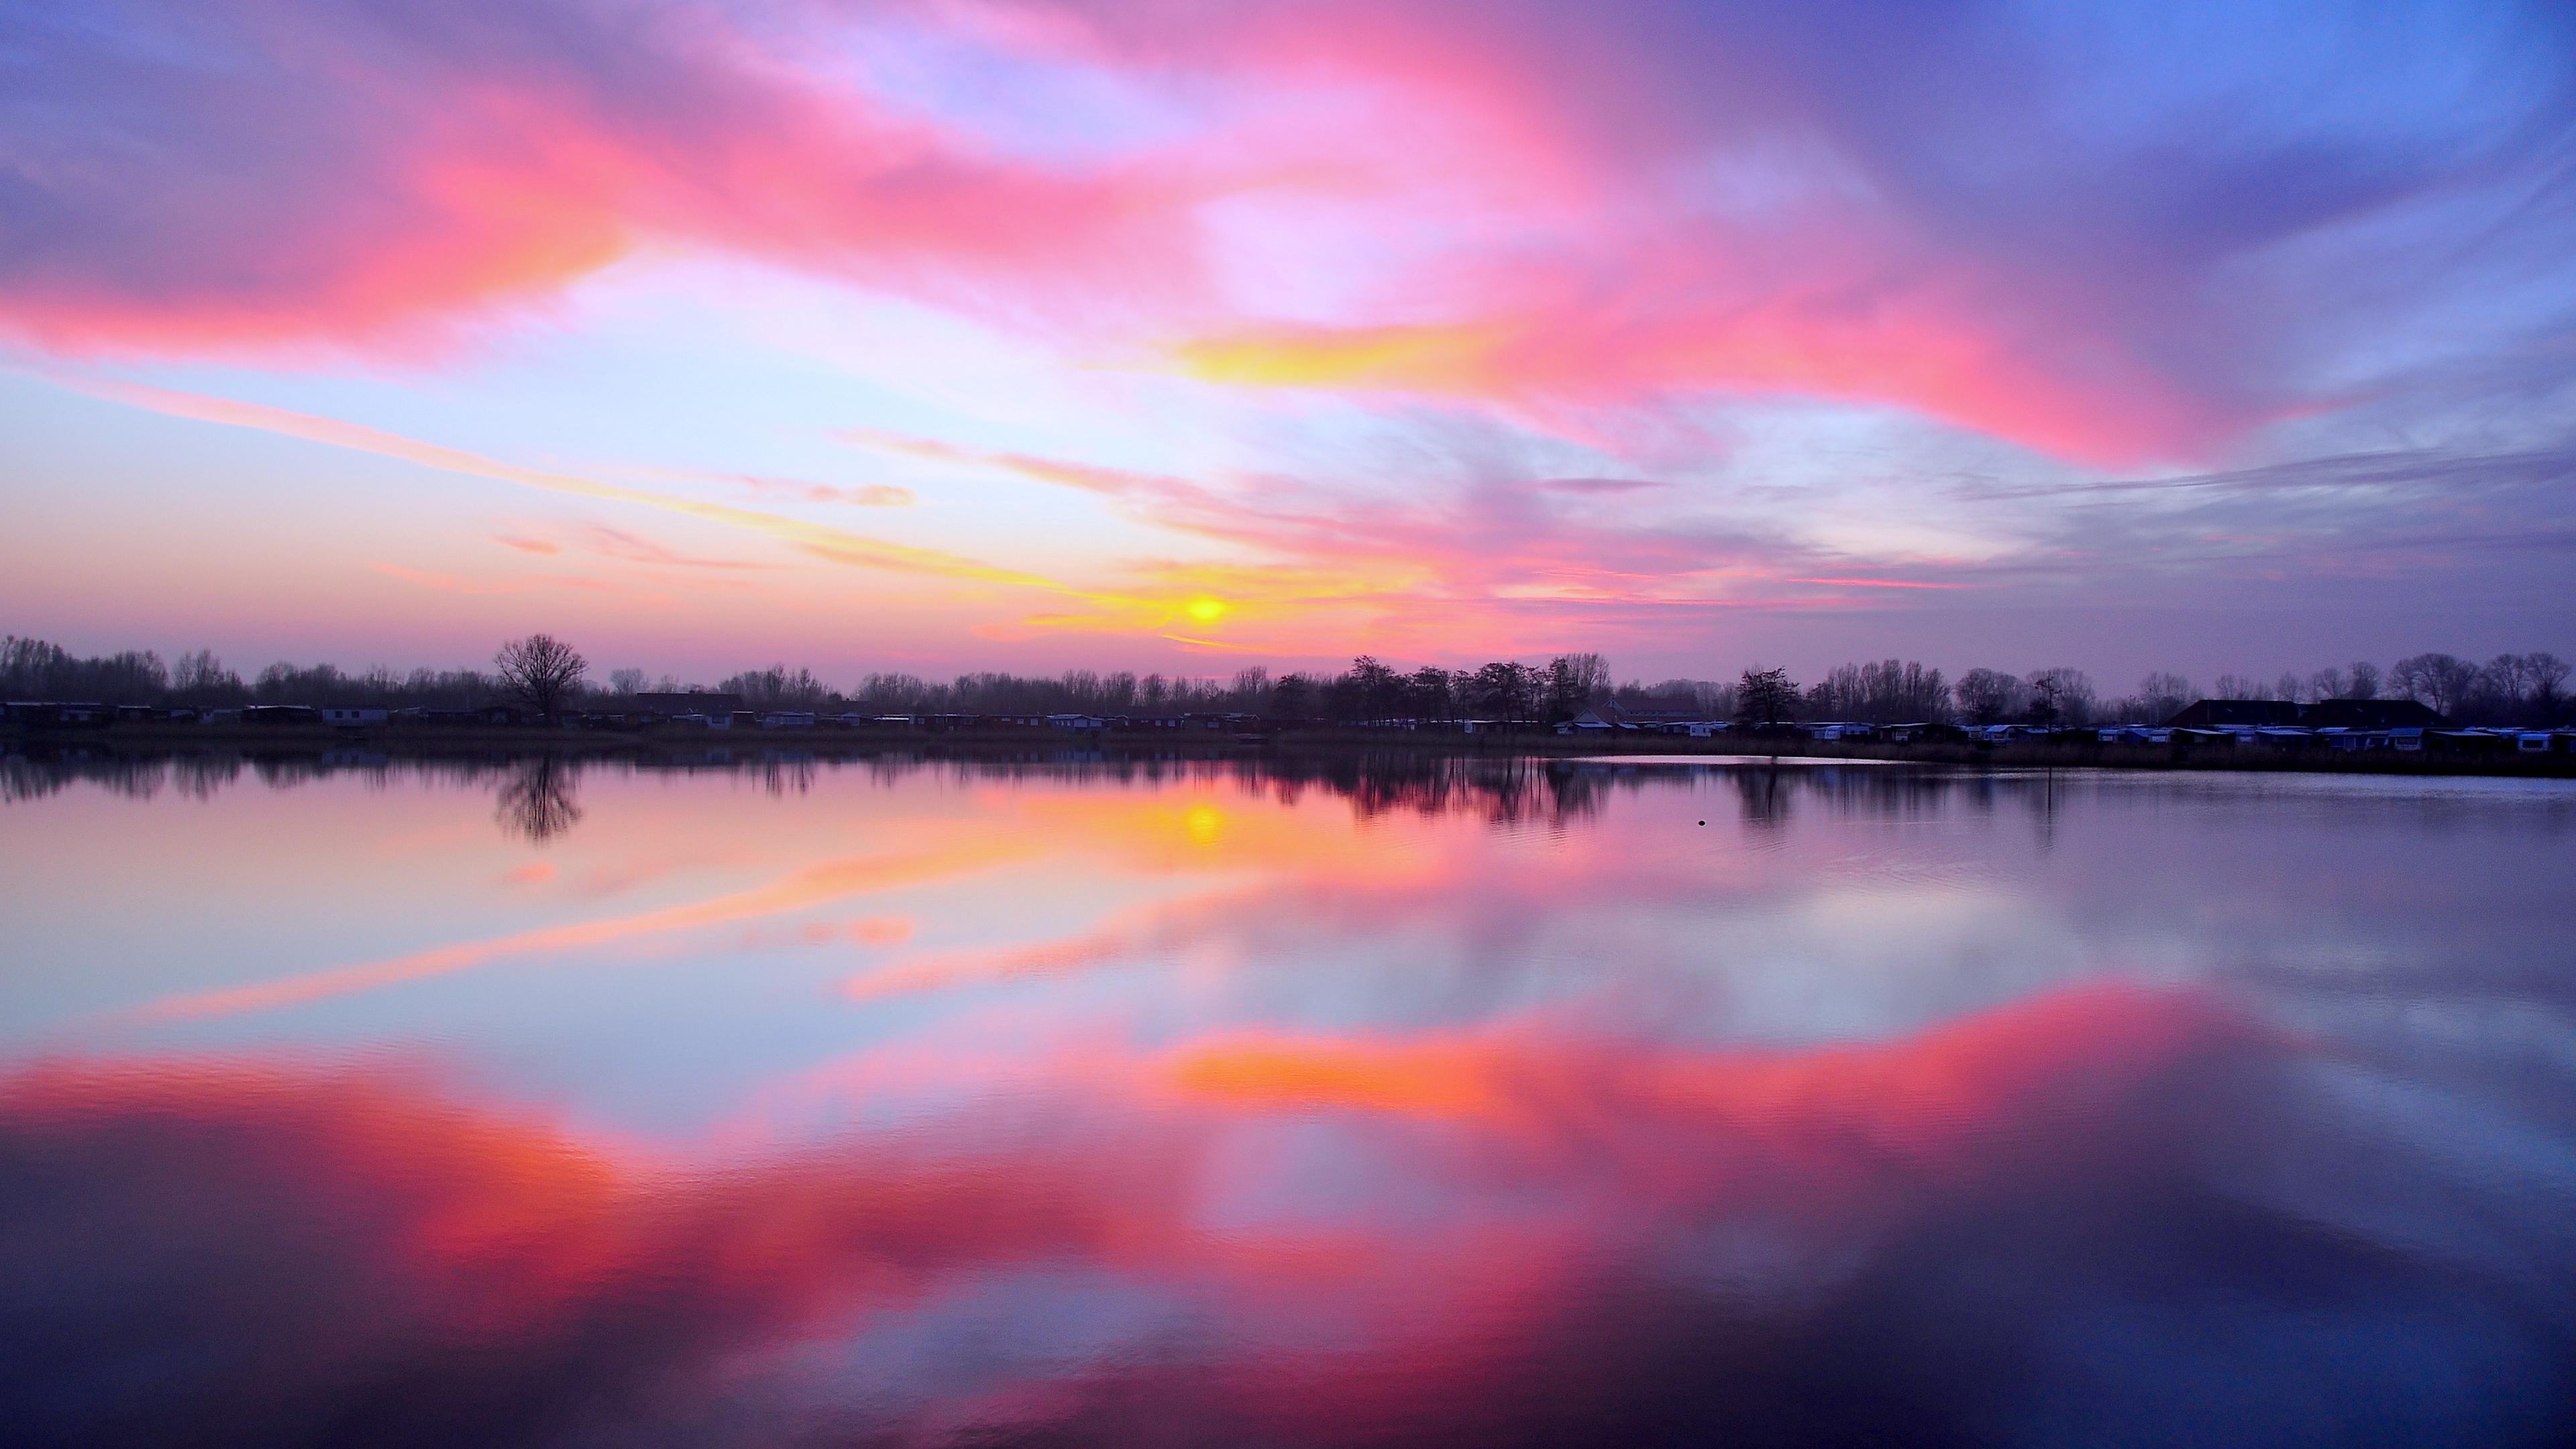 lake sunset reflection sky horizon 4k 1541117827 - lake, sunset, reflection, sky, horizon 4k - sunset, reflection, Lake